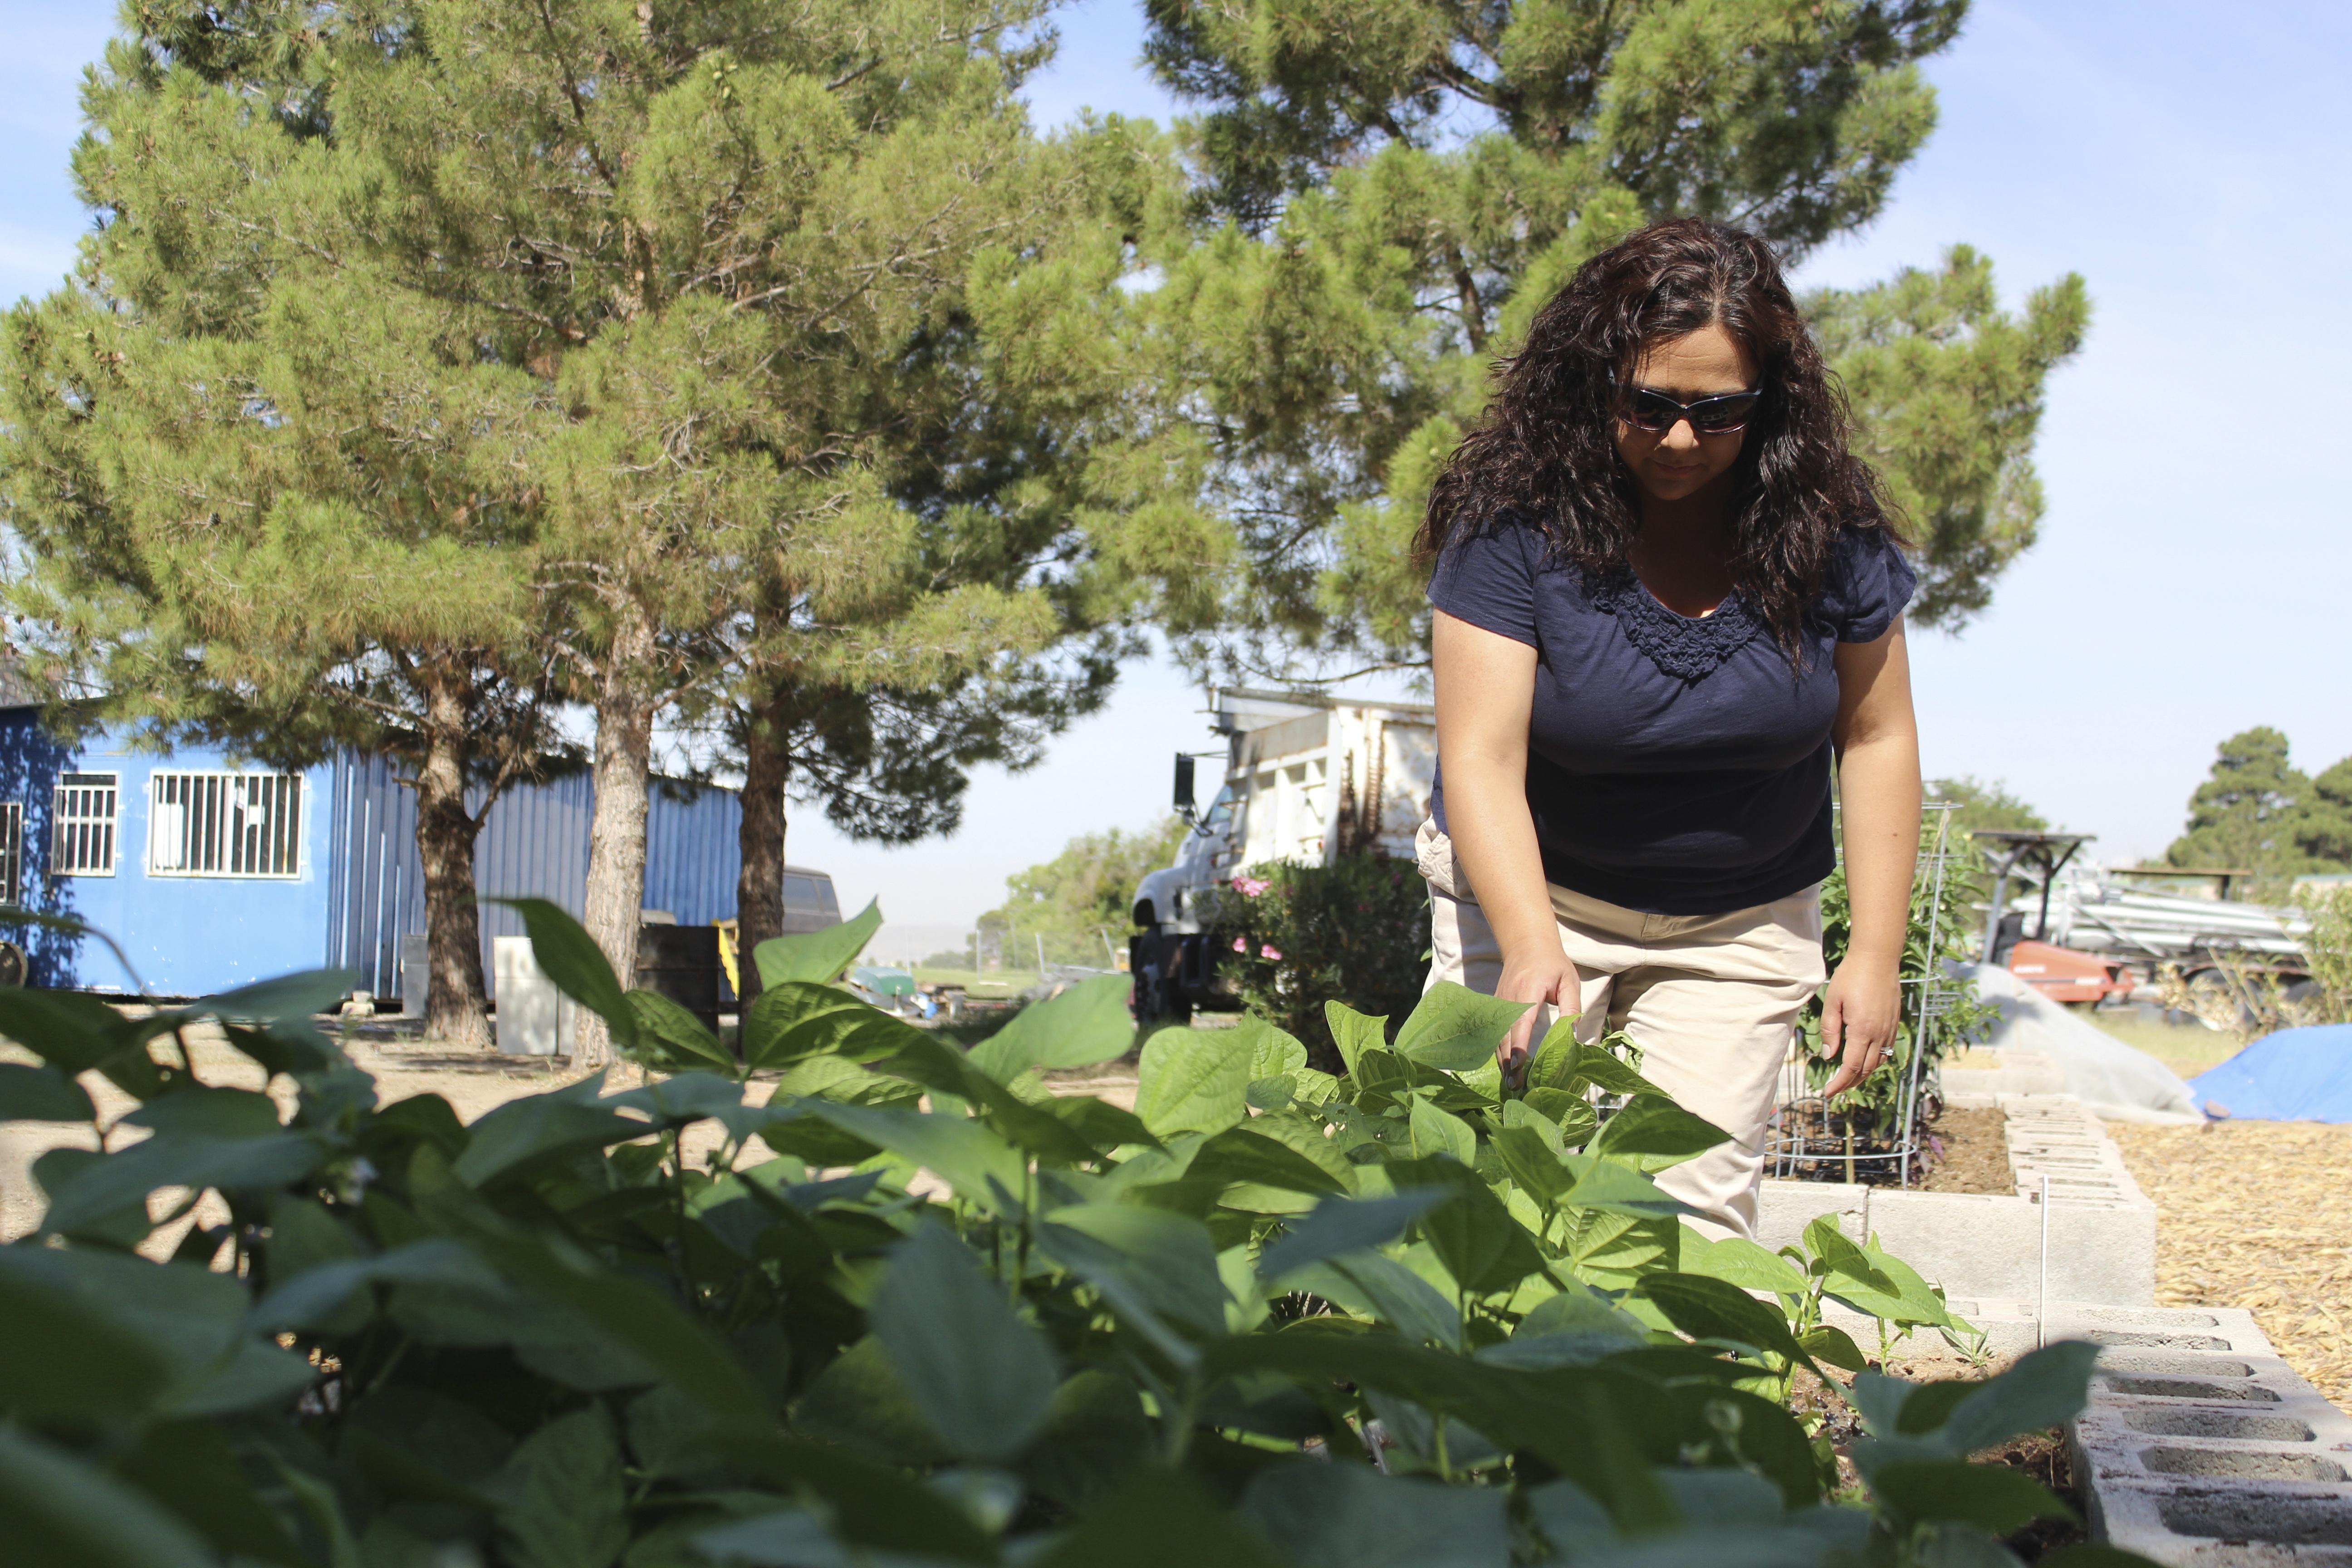 denise rodriguez organized el paso countys first community garden in ascarate park the garden has - The Garden El Paso